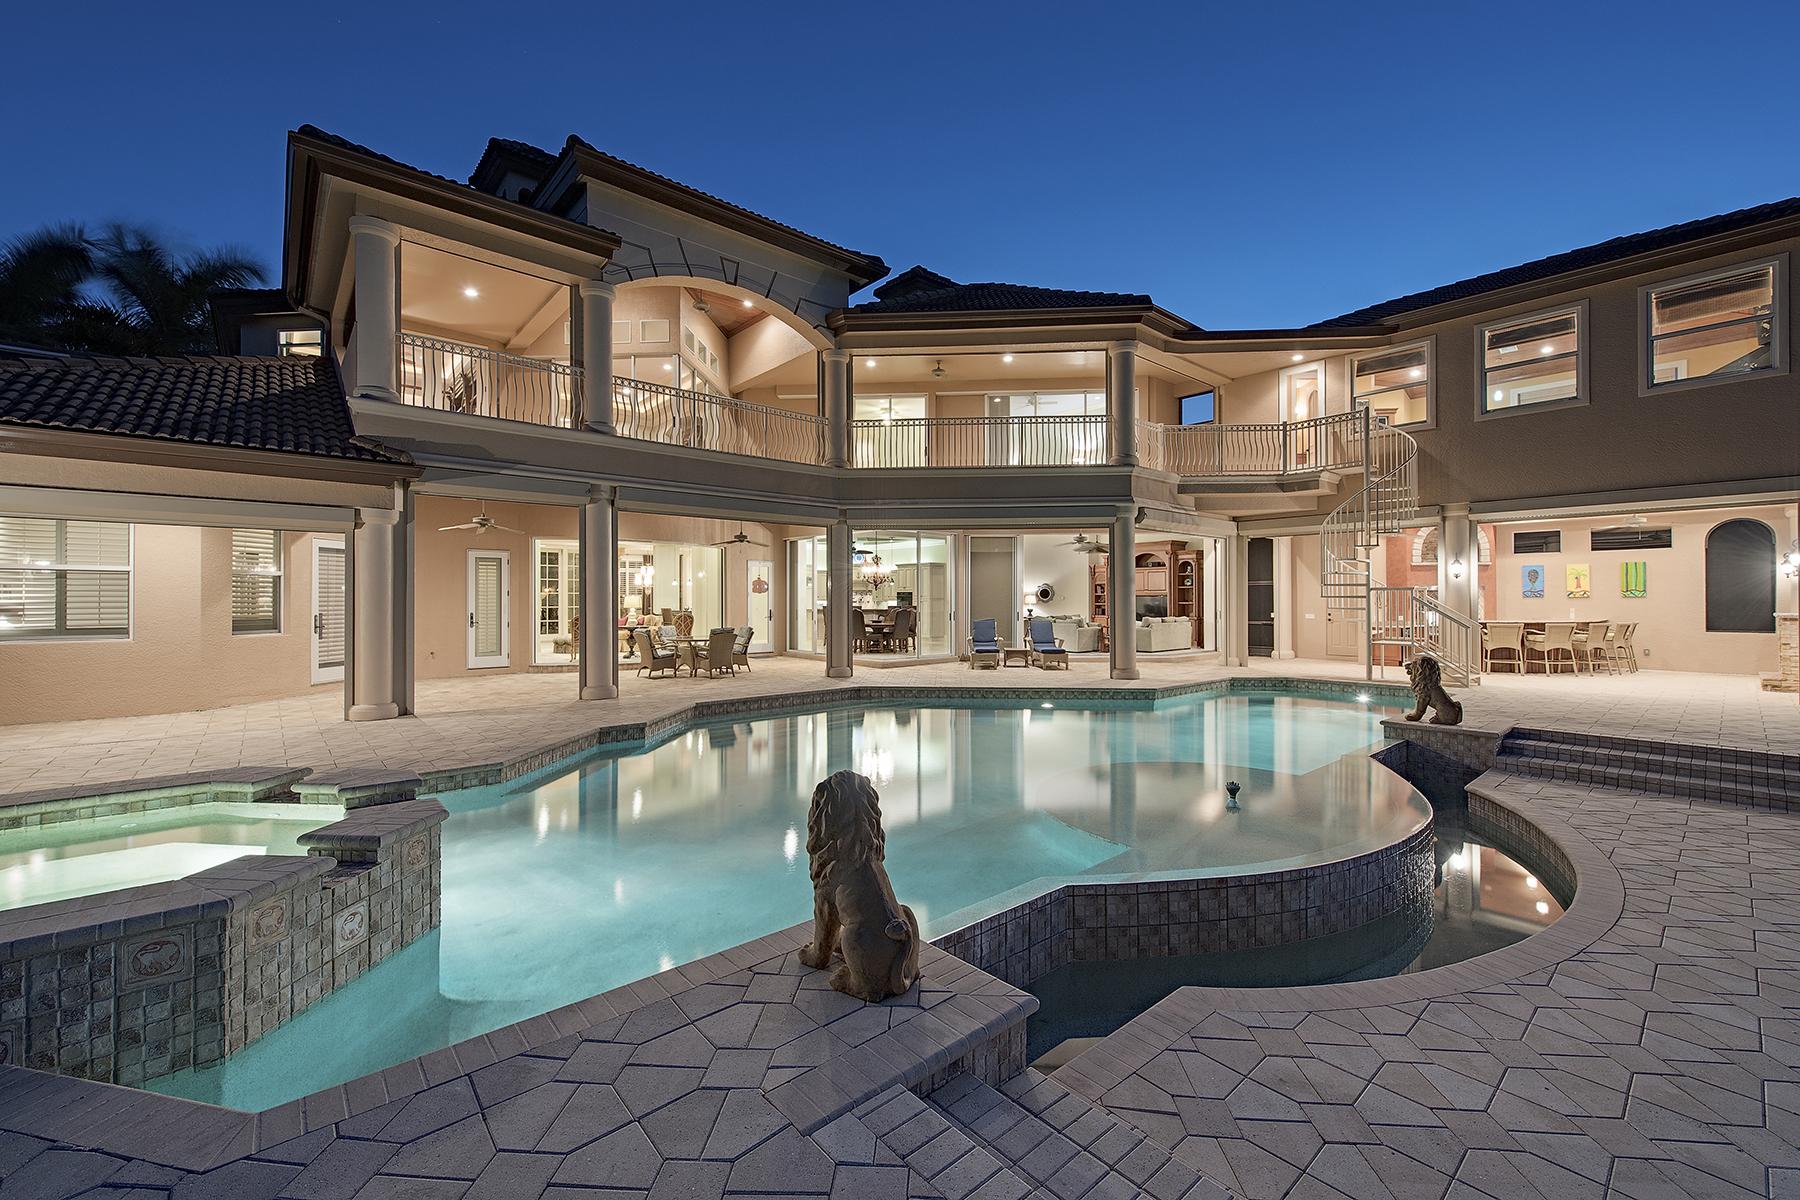 Single Family Home for Sale at PELICAN MARSH - BAY LAUREL ESTATES 8647 Blue Flag Way Naples, Florida, 34109 United States